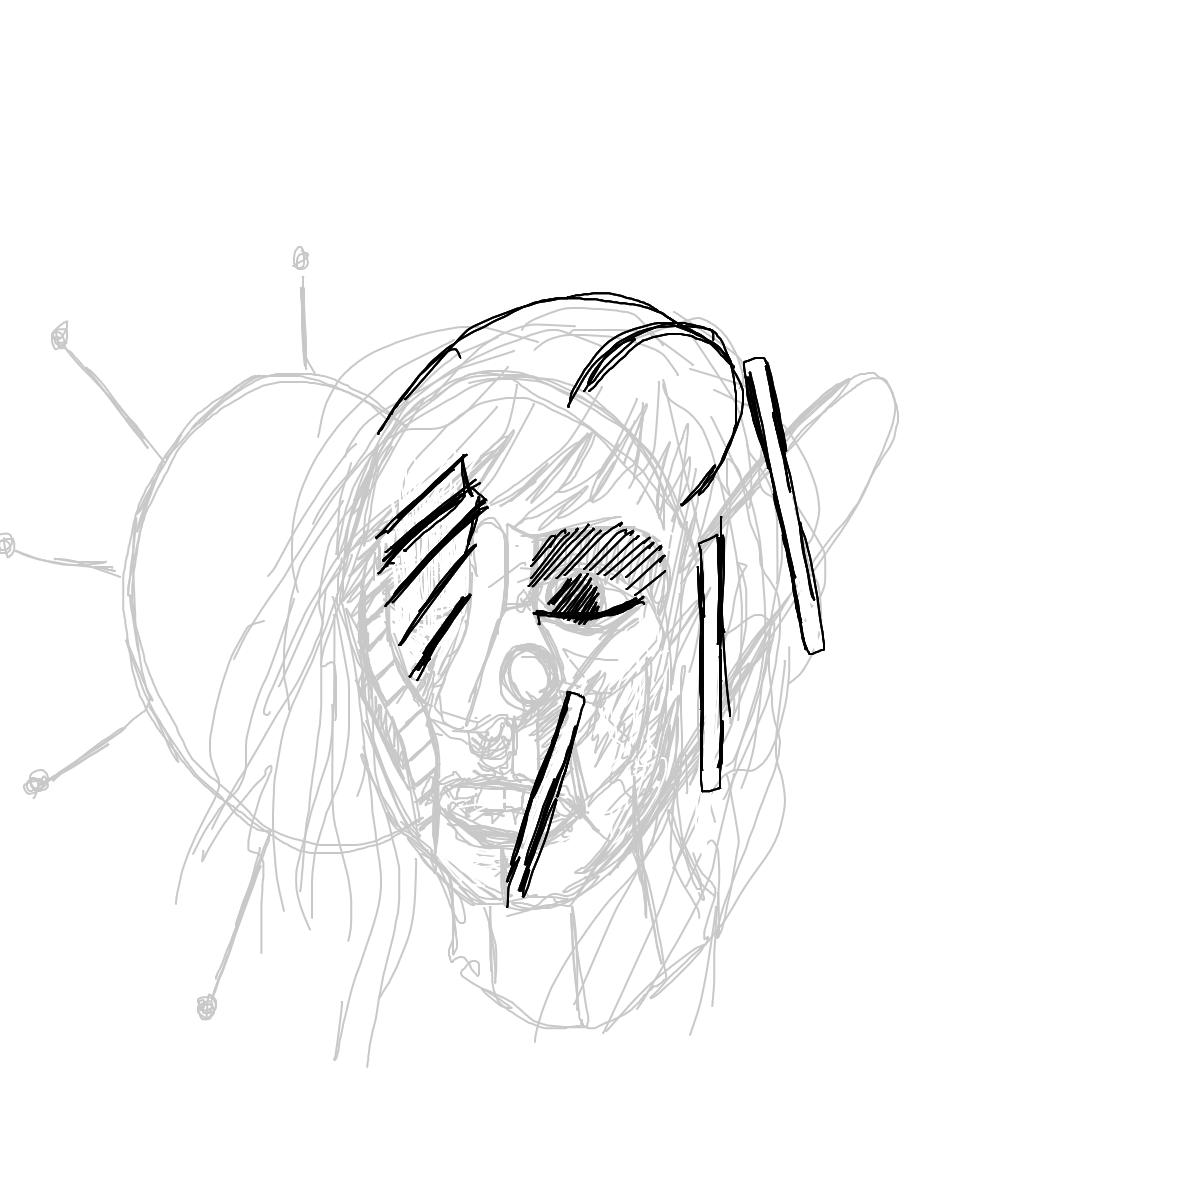 BAAAM drawing#5705 lat:51.5427284240722660lng: -0.1421043574810028